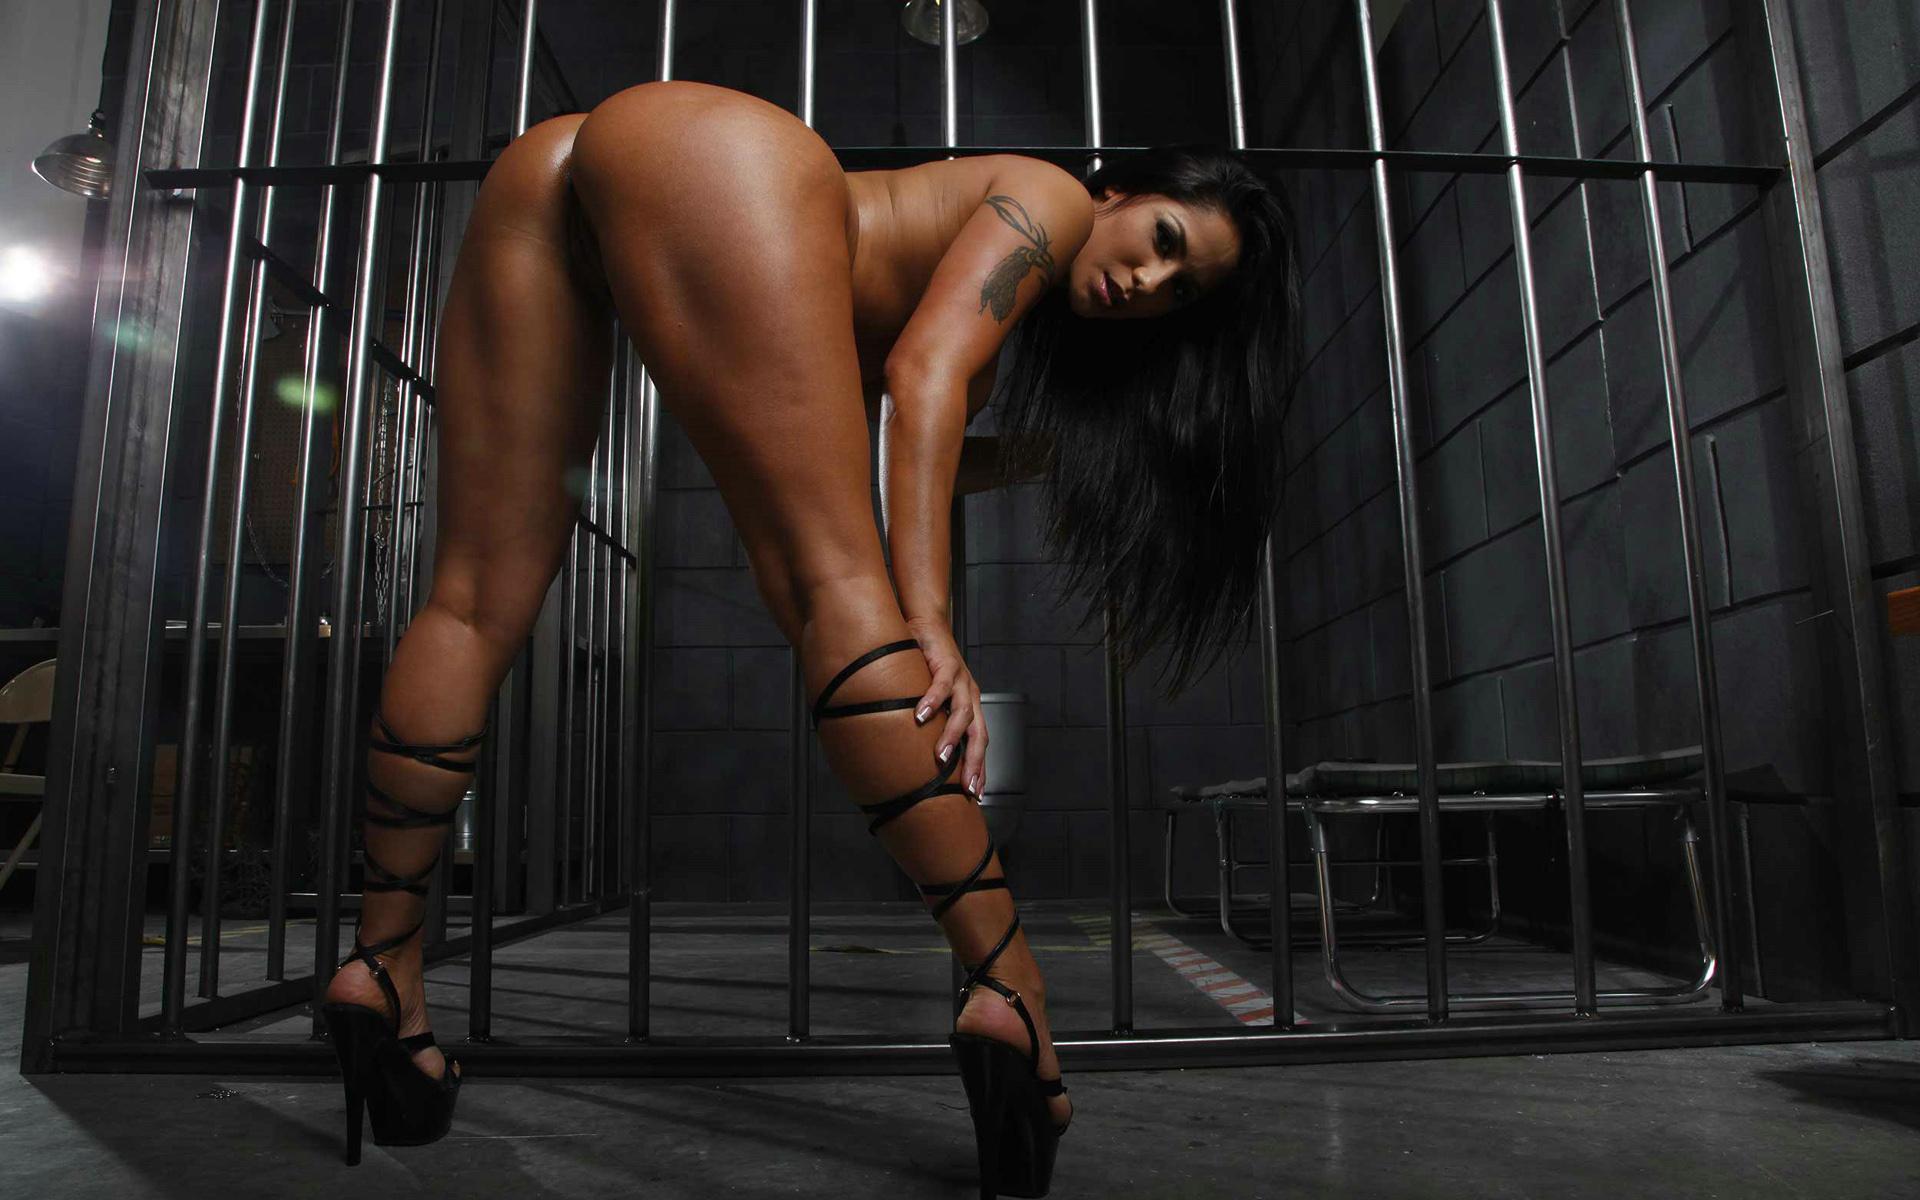 Секси девушки за решеткой эро фото 2 фотография